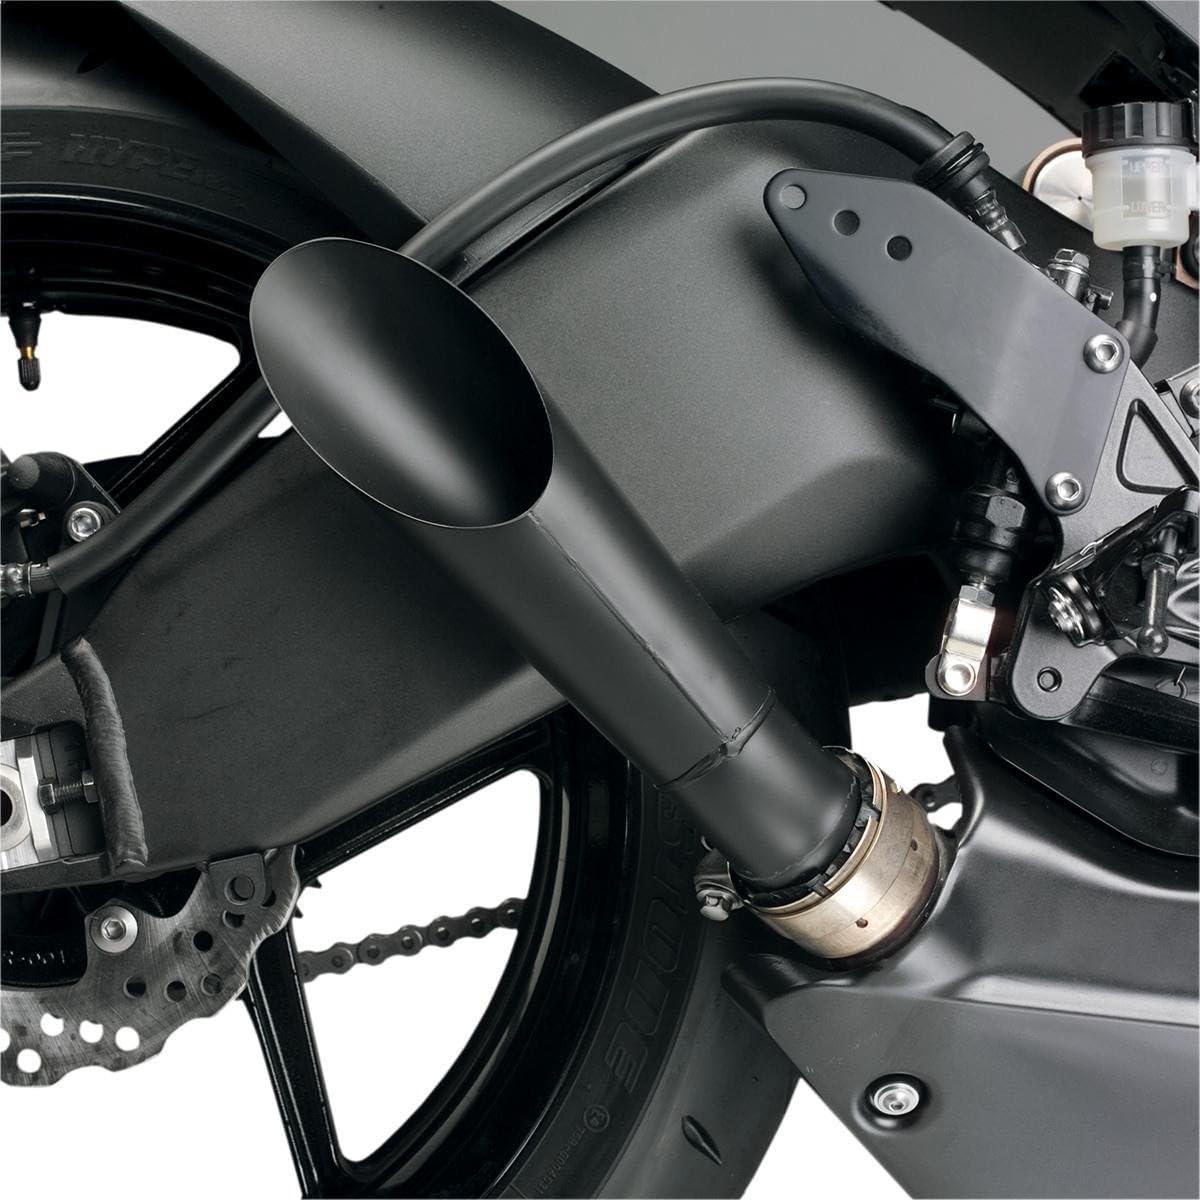 Hotbodies Store Racing Megaphone Slip-On Black Exhaust Y06R6-XSO-BLK - Import